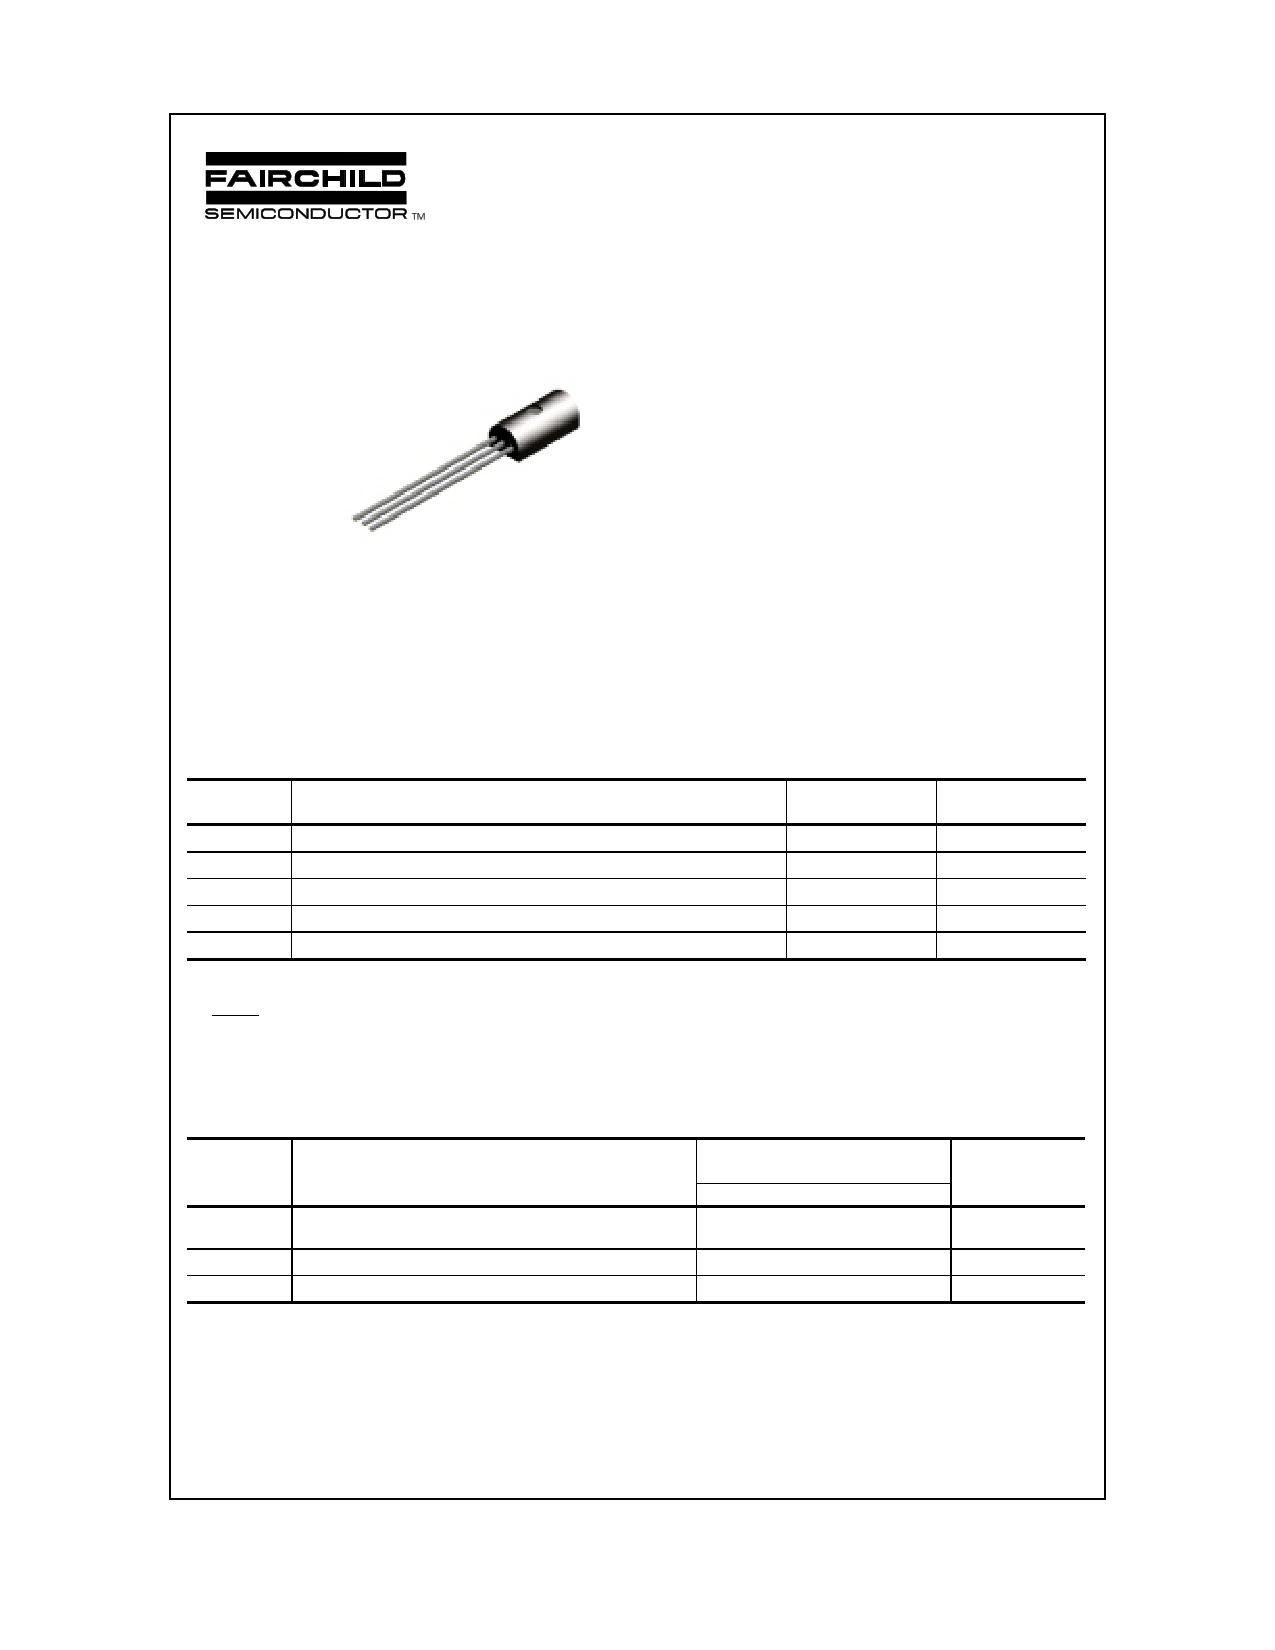 TN2905A datasheet, circuit